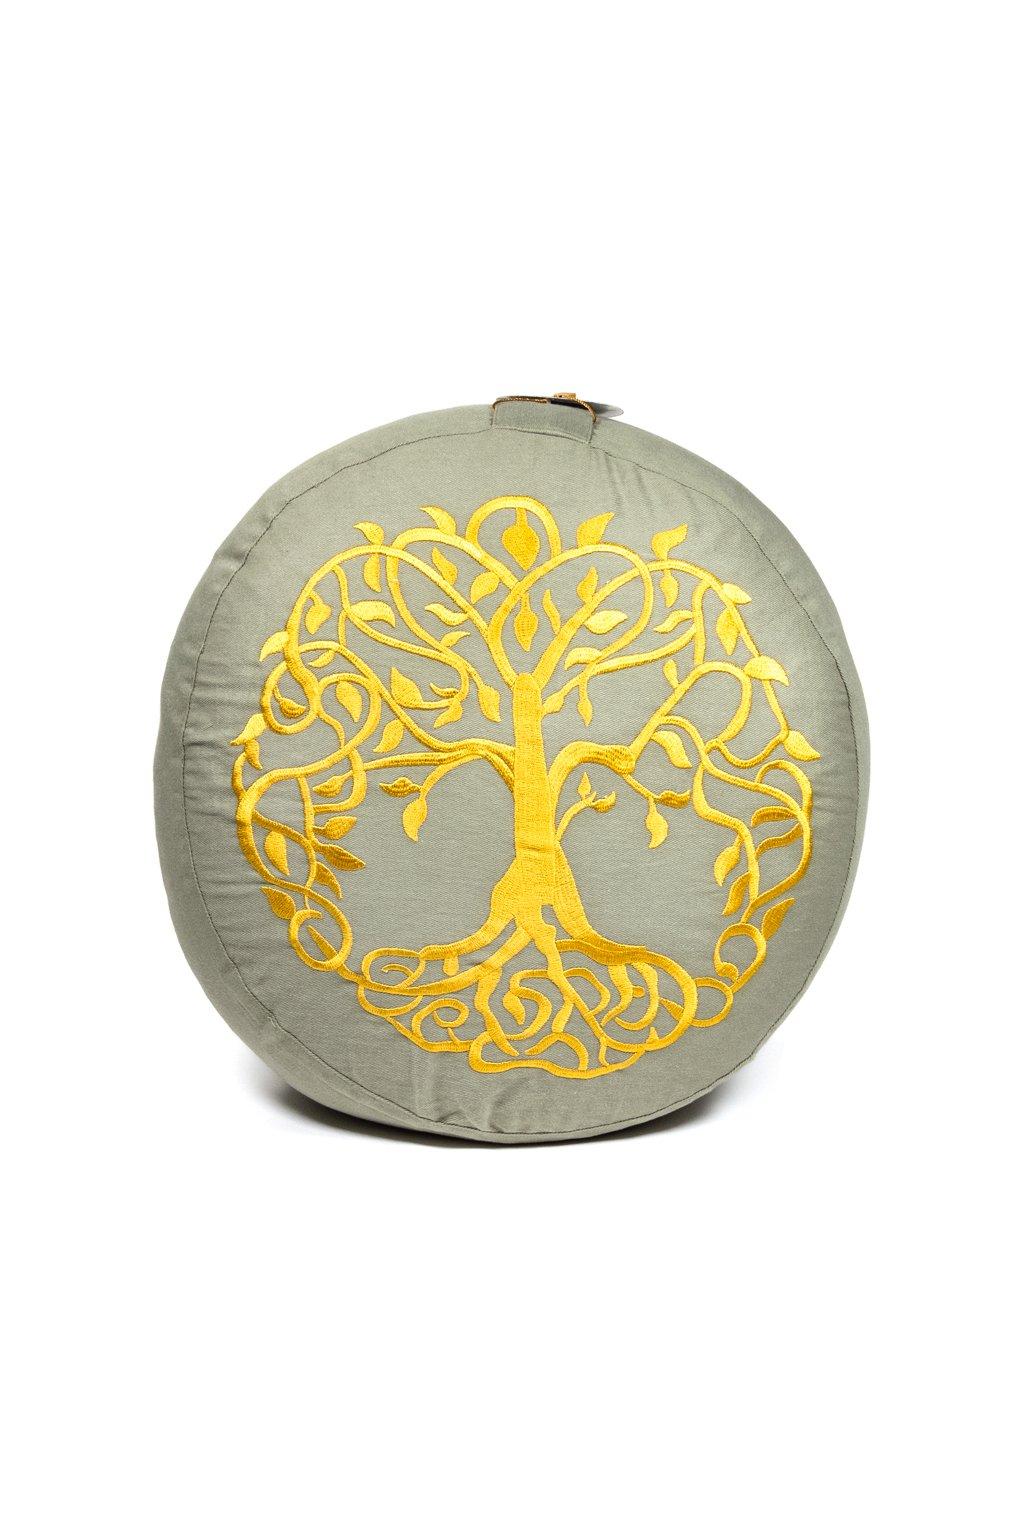 Meditační polštář vyšívaný Strom života - šedý se zlatou